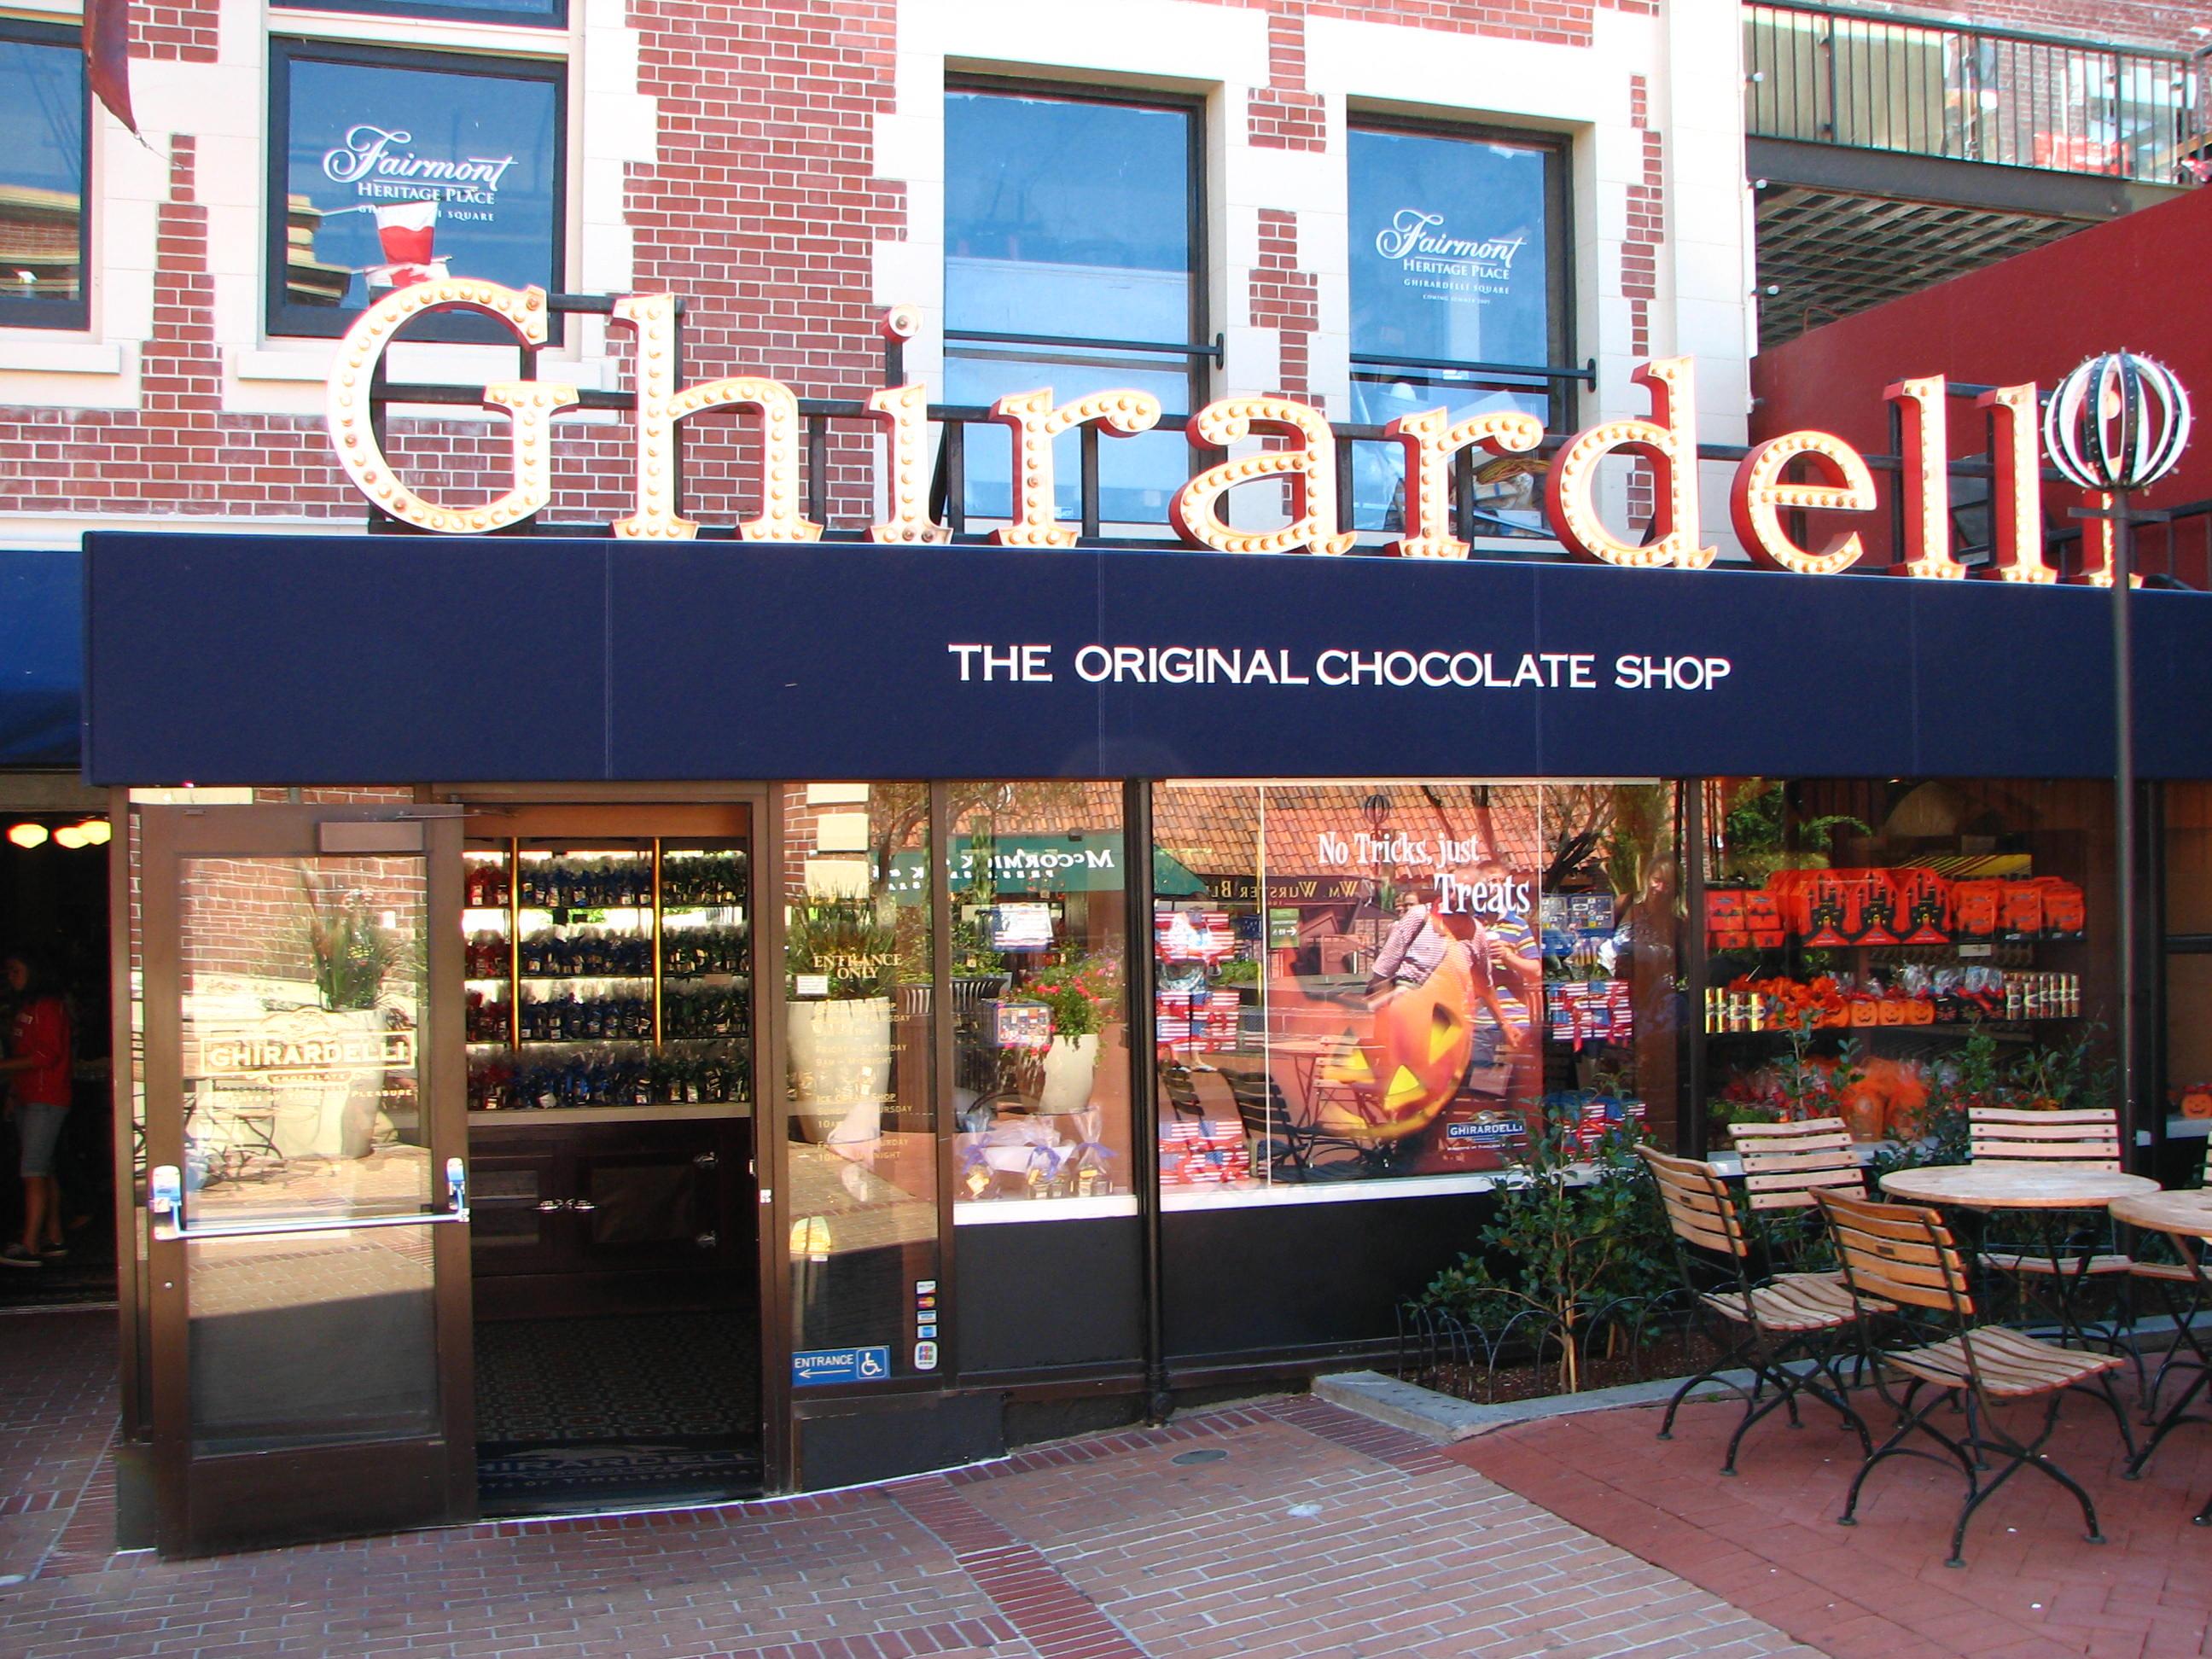 File:Ghirardelli Chocolate Shop.jpg - Wikimedia Commons